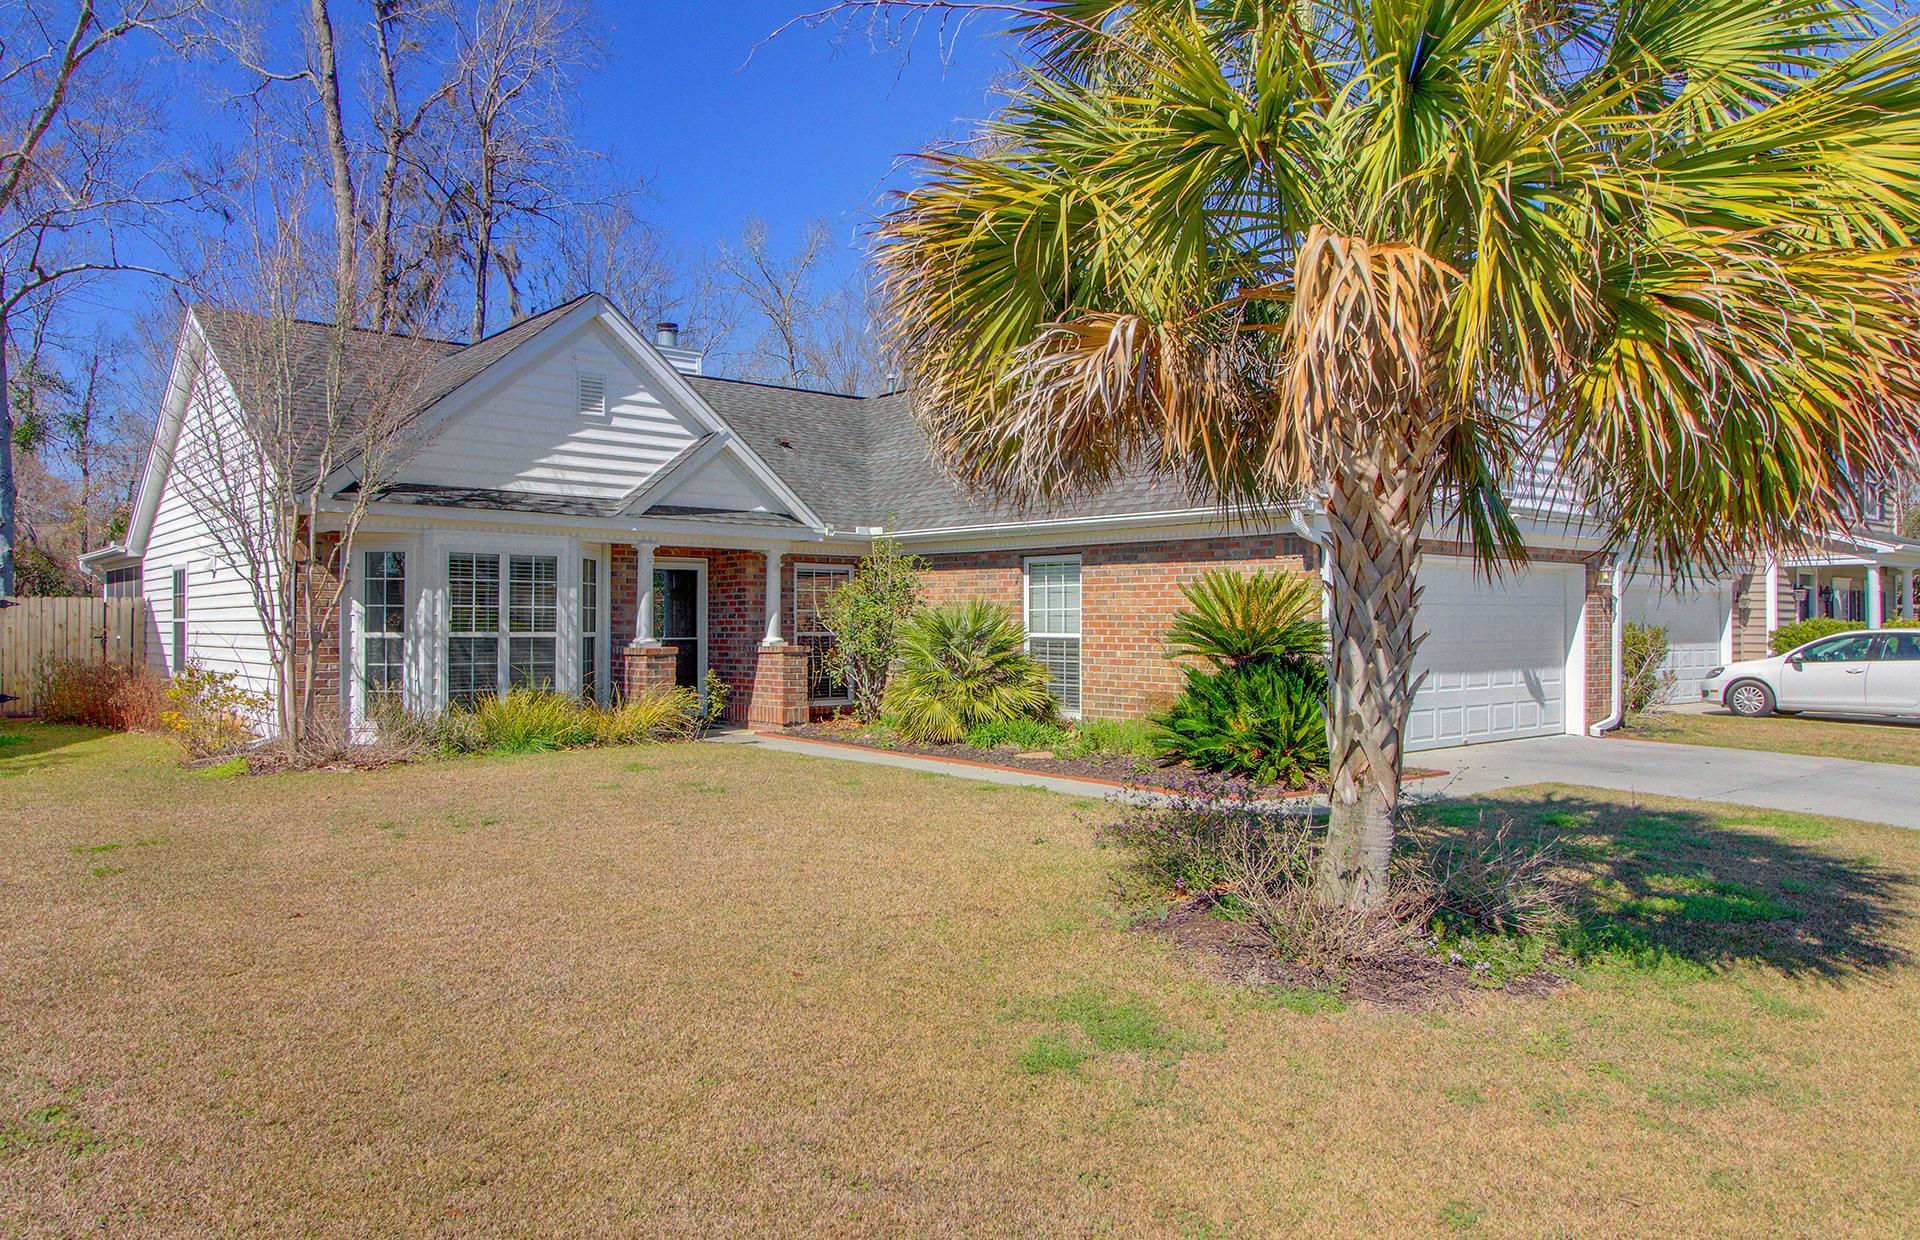 Grand Oaks Plantation Homes For Sale - 789 Bent Hickory, Charleston, SC - 1